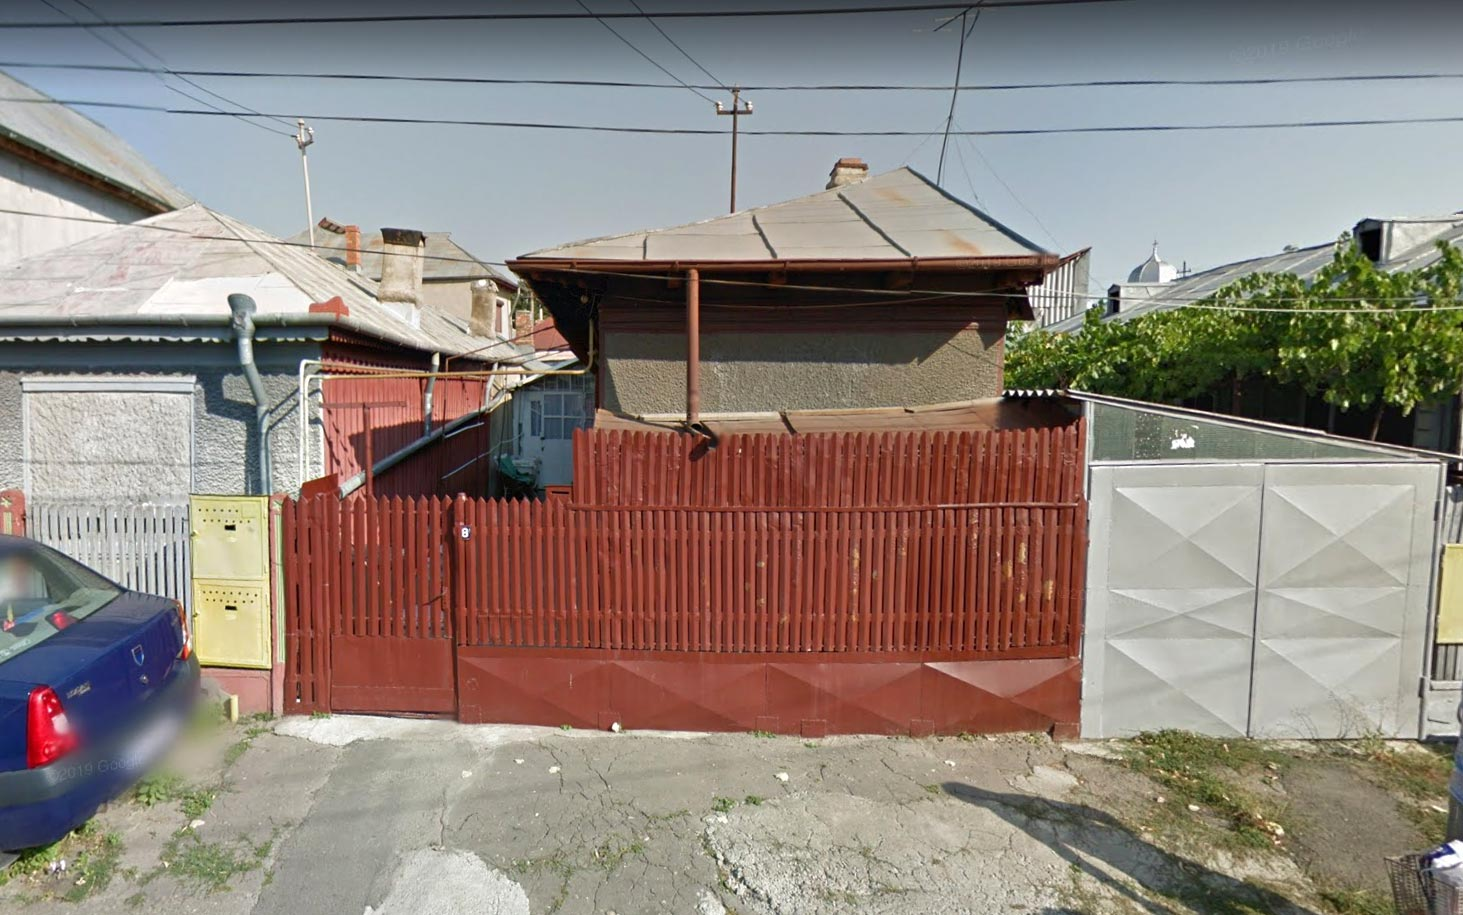 Casa 3 camere, 43,41mp + teren intravilan 124mp, Buzau, jud. Buzau